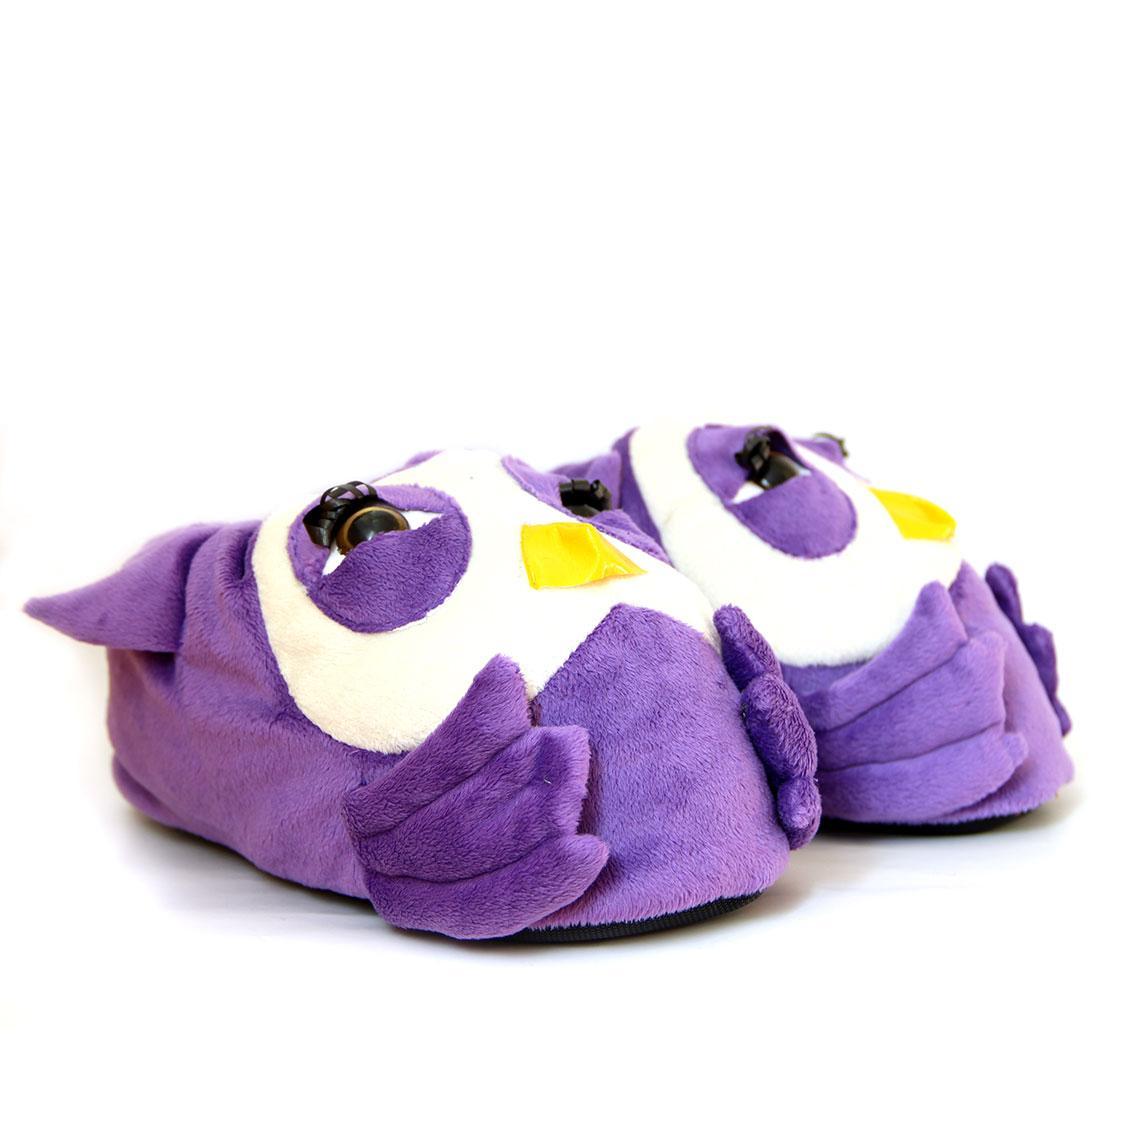 "Мягкие тапочки-игрушки ""Совы"""